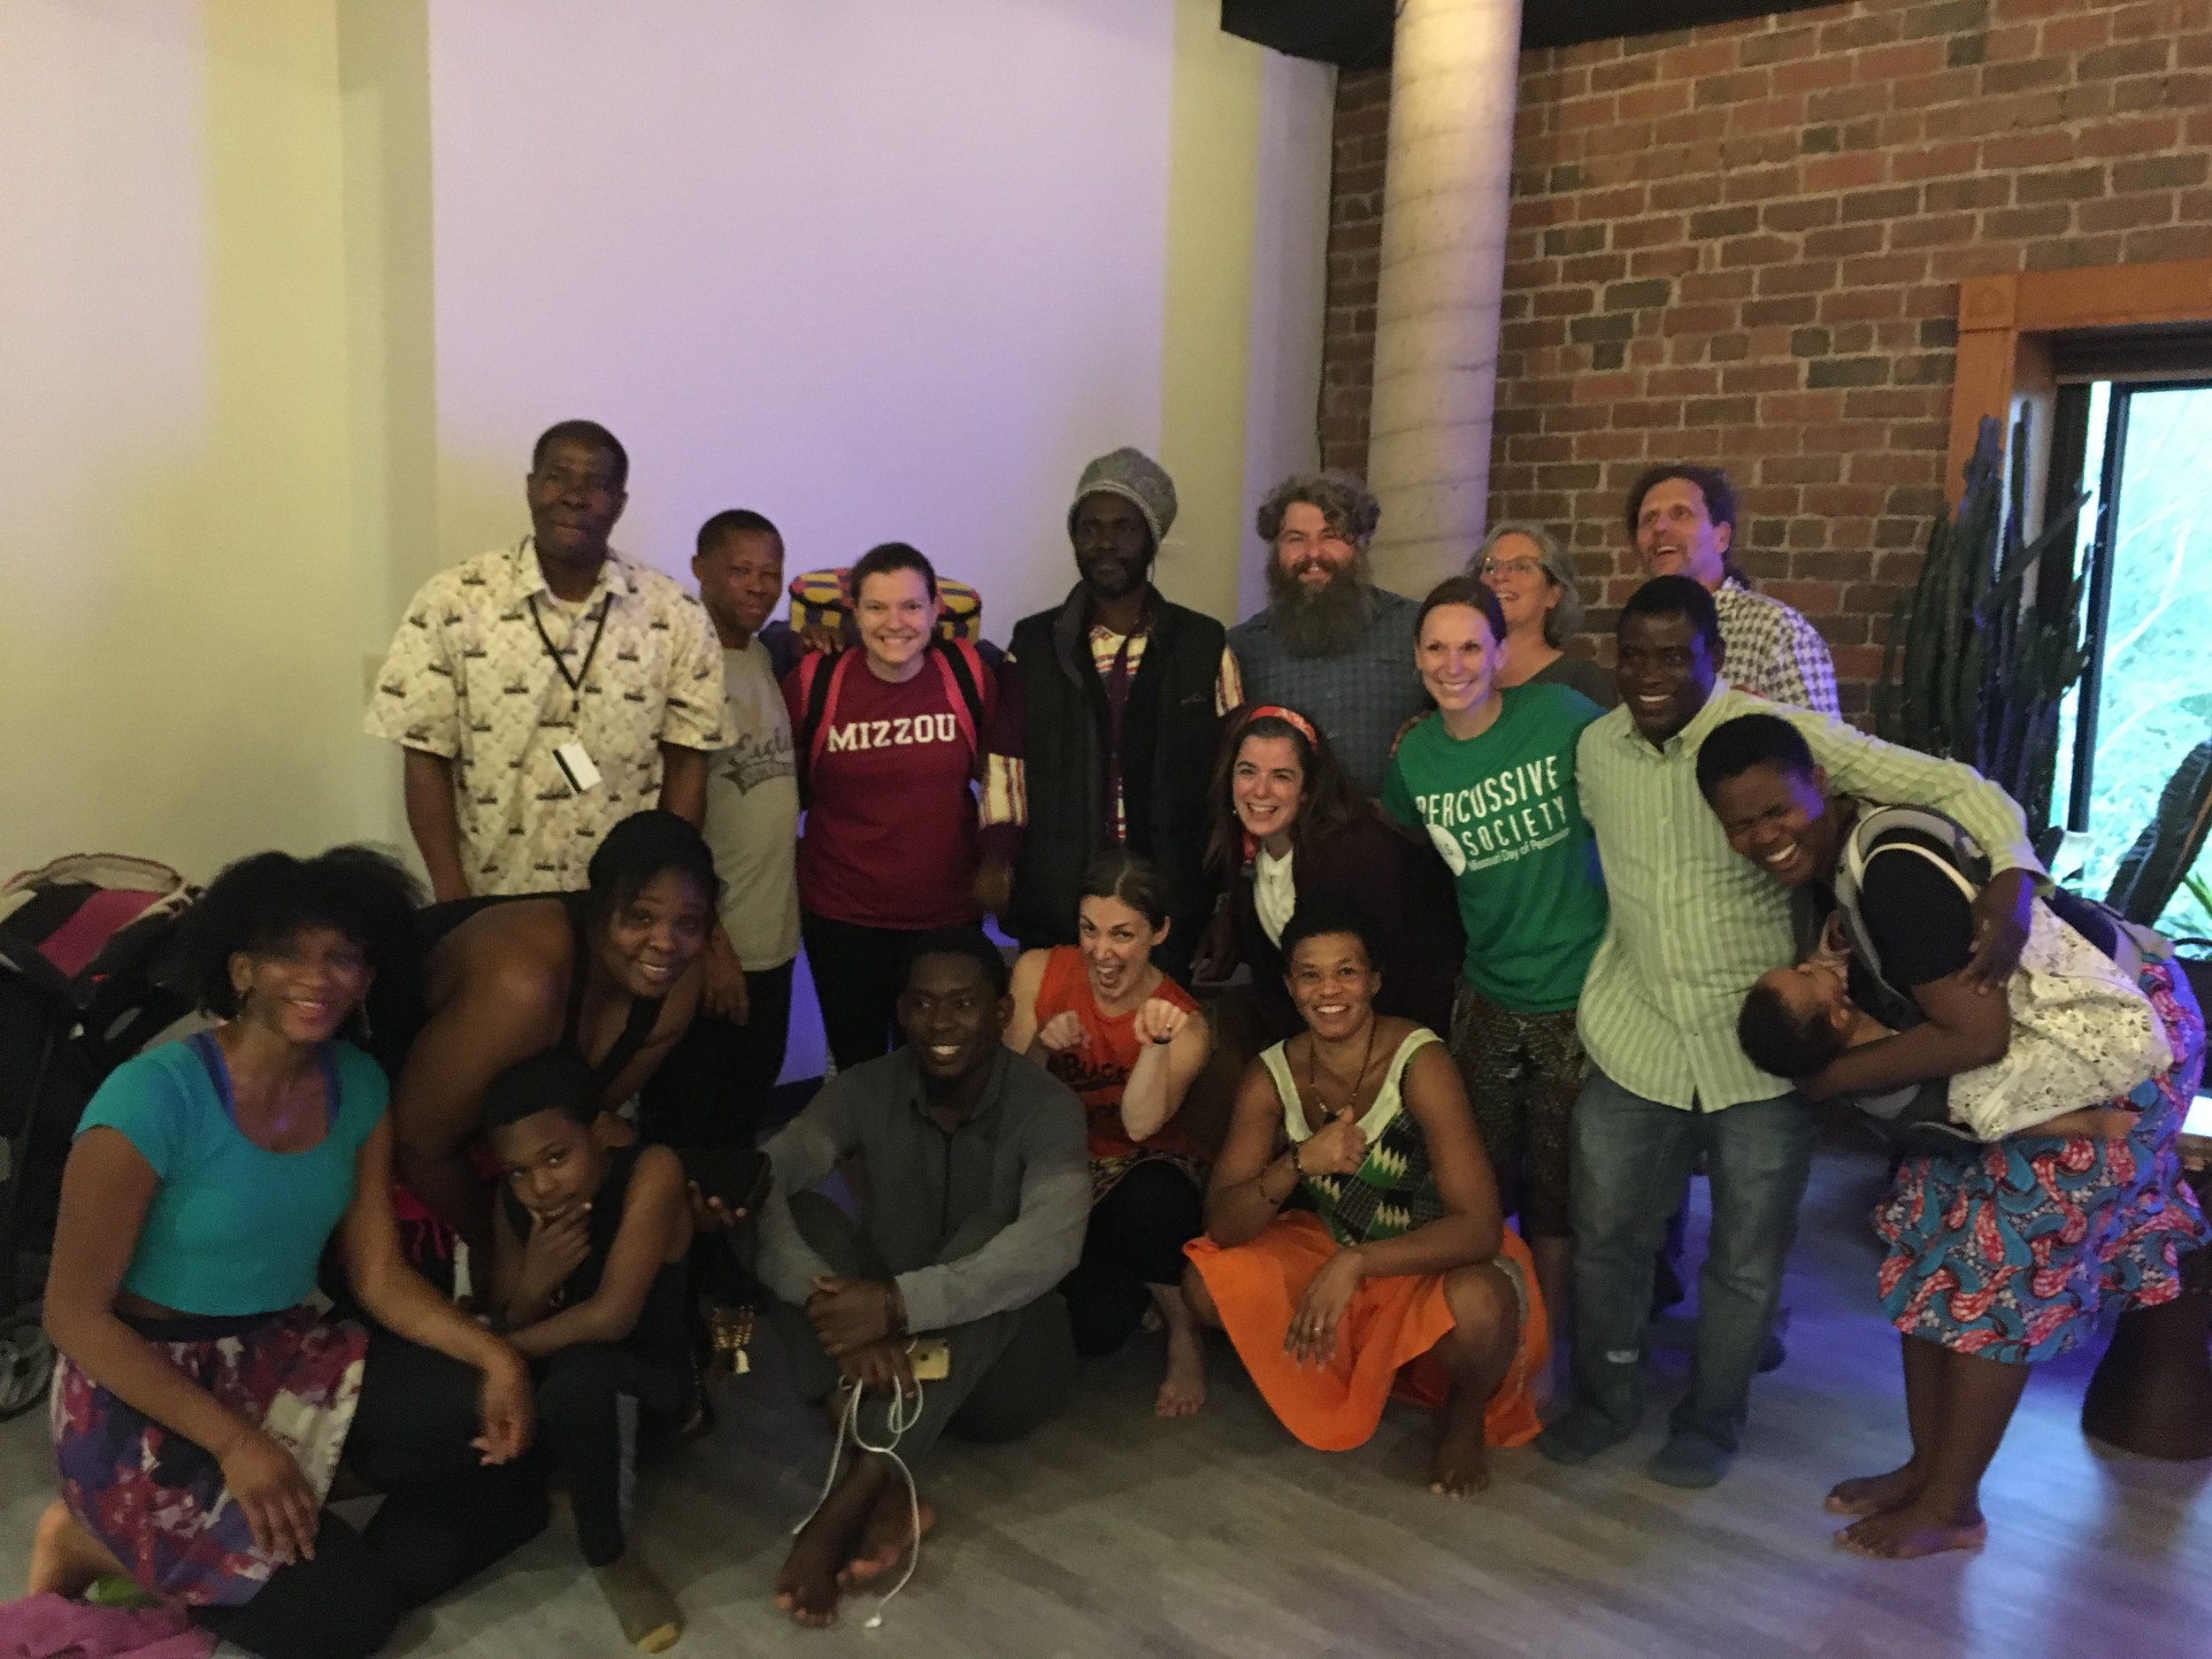 University of Missouri Percussion students and community members with Saakumu Dance Troupe.